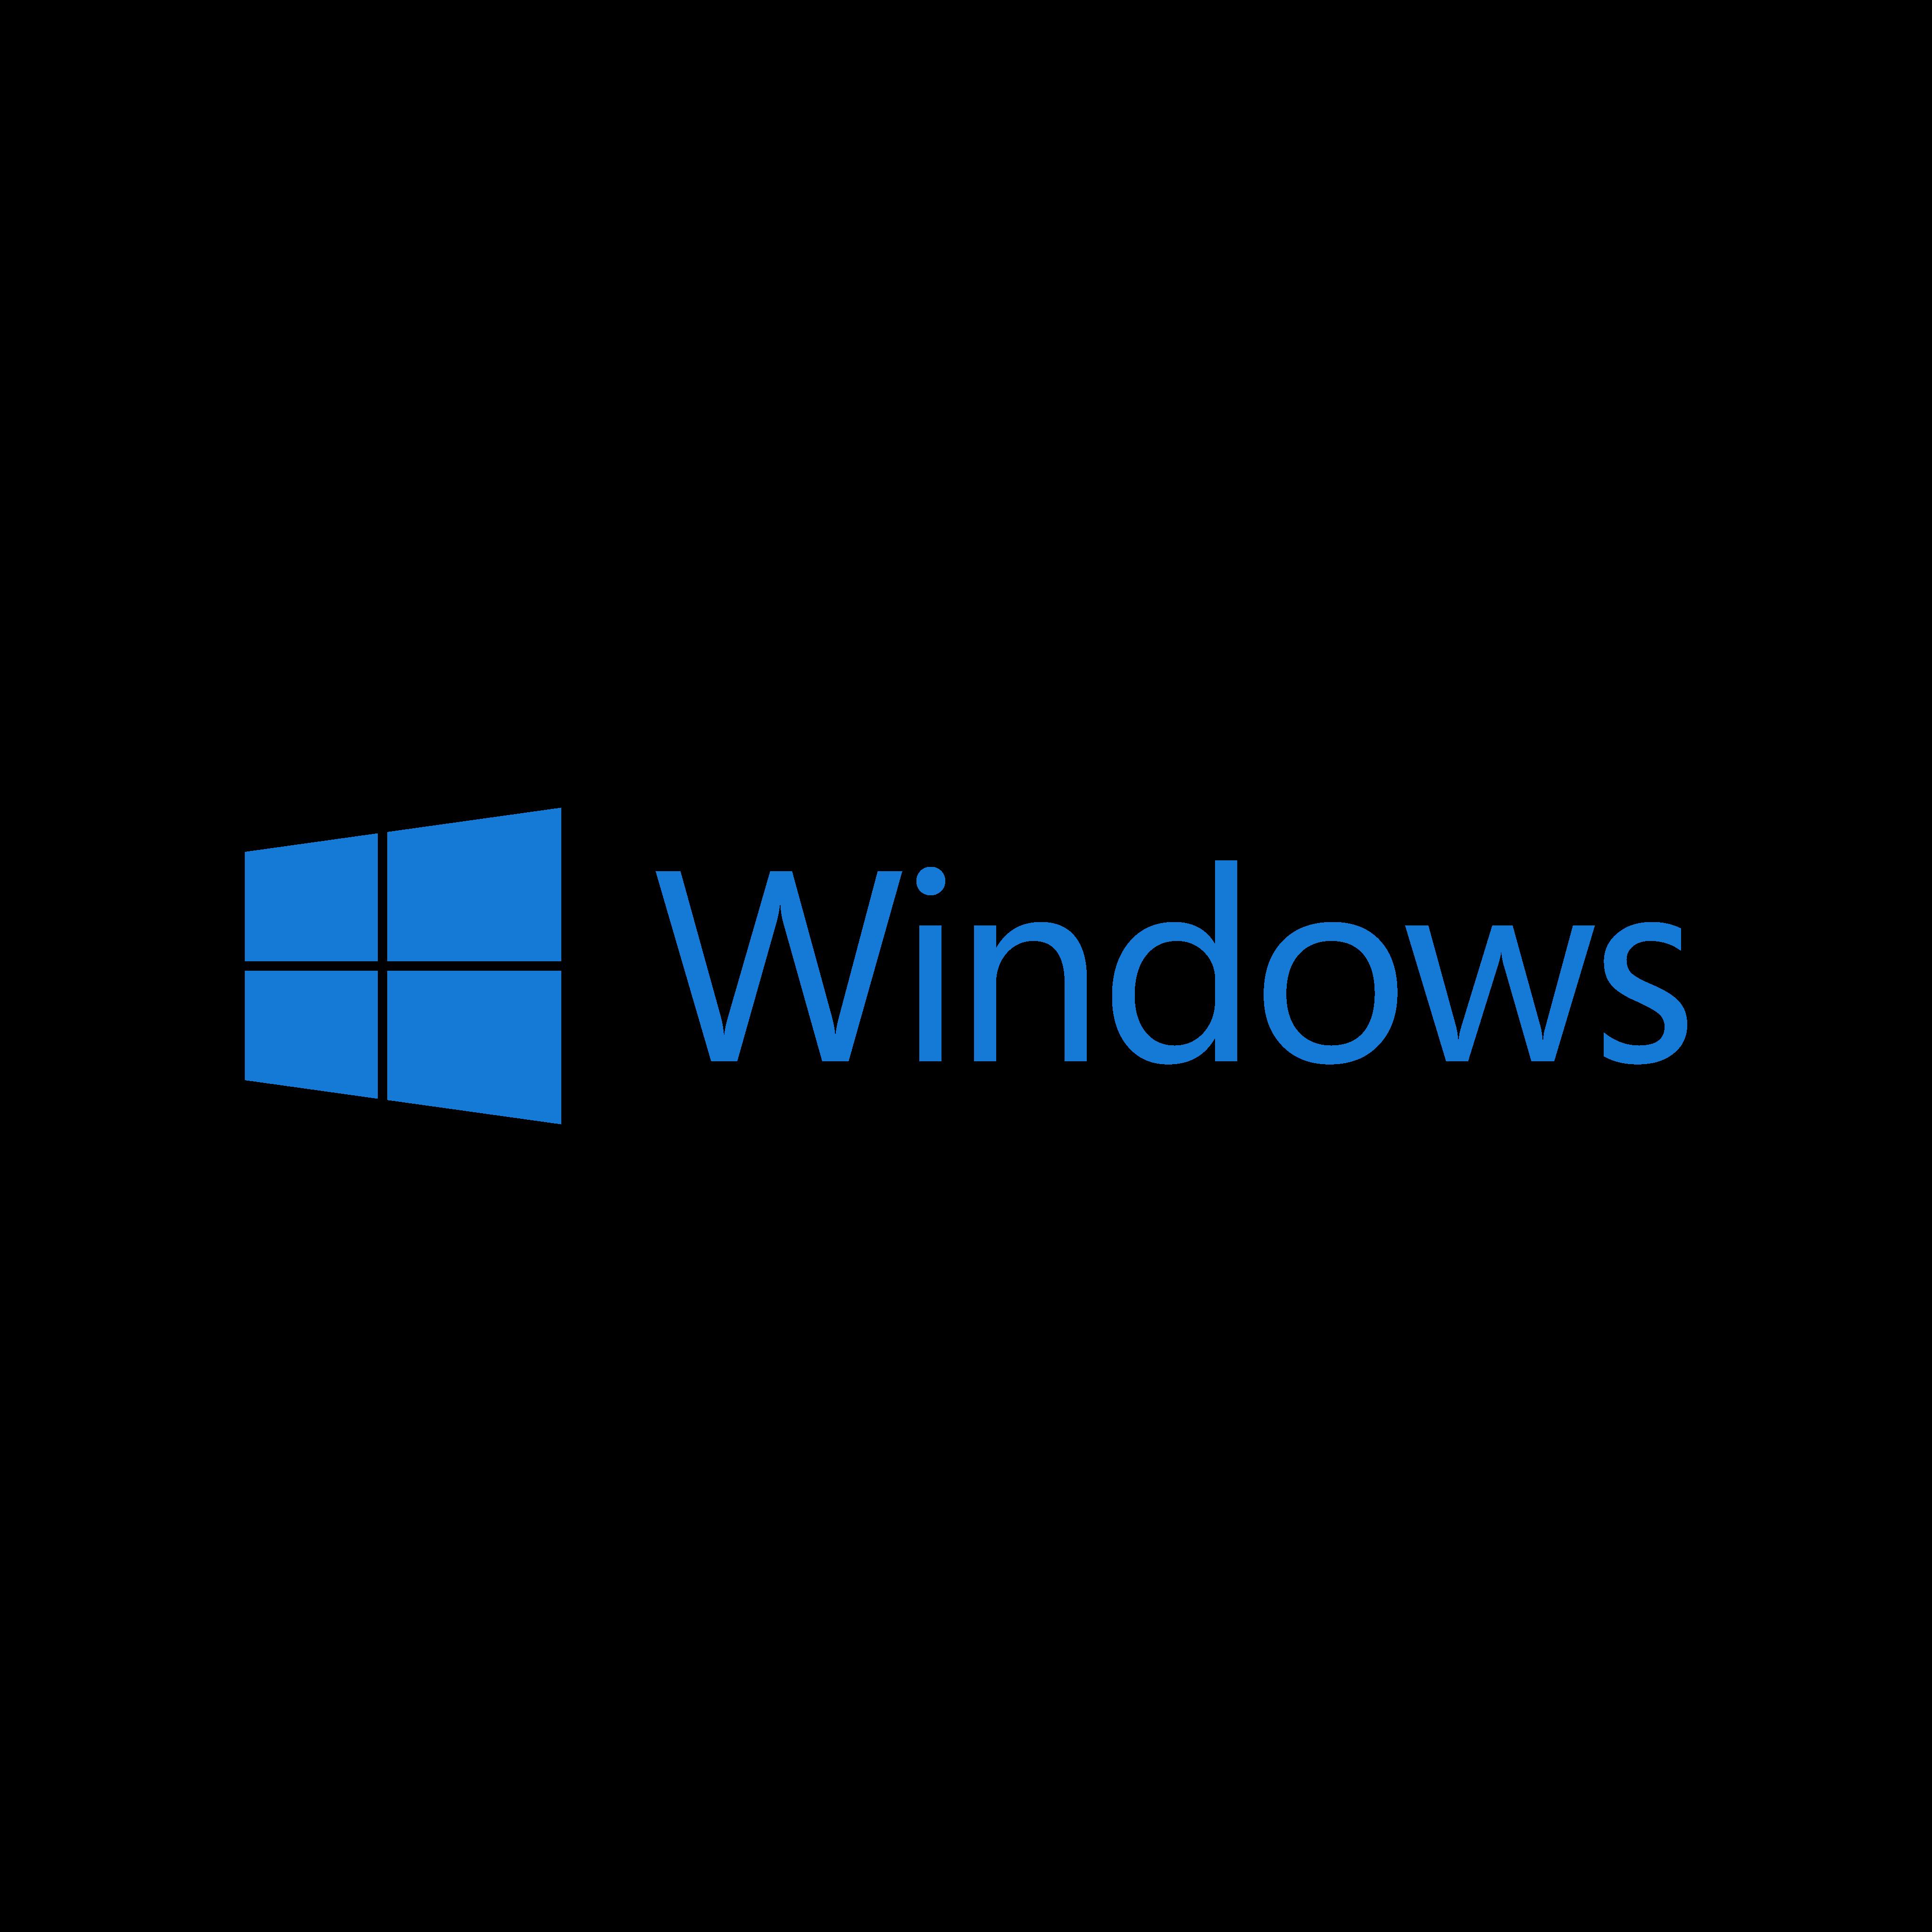 windows logo 0 - Windows Logo